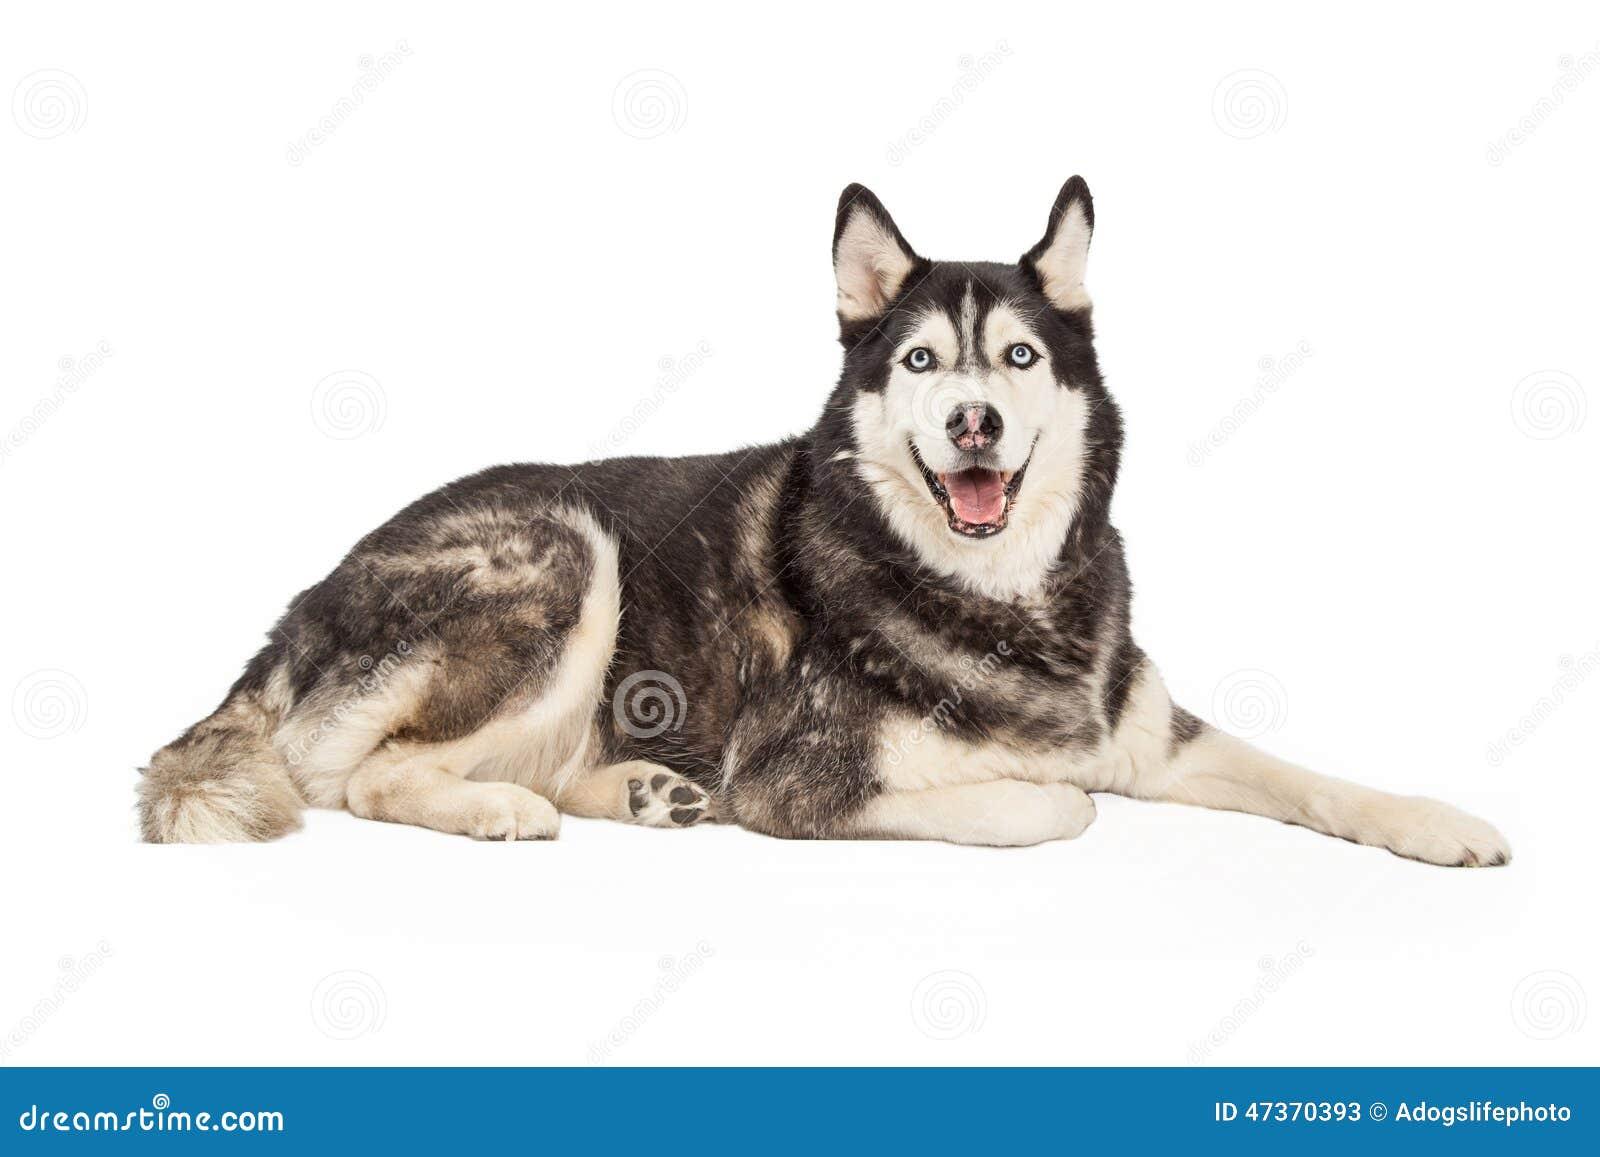 how to train a siberian husky obedience